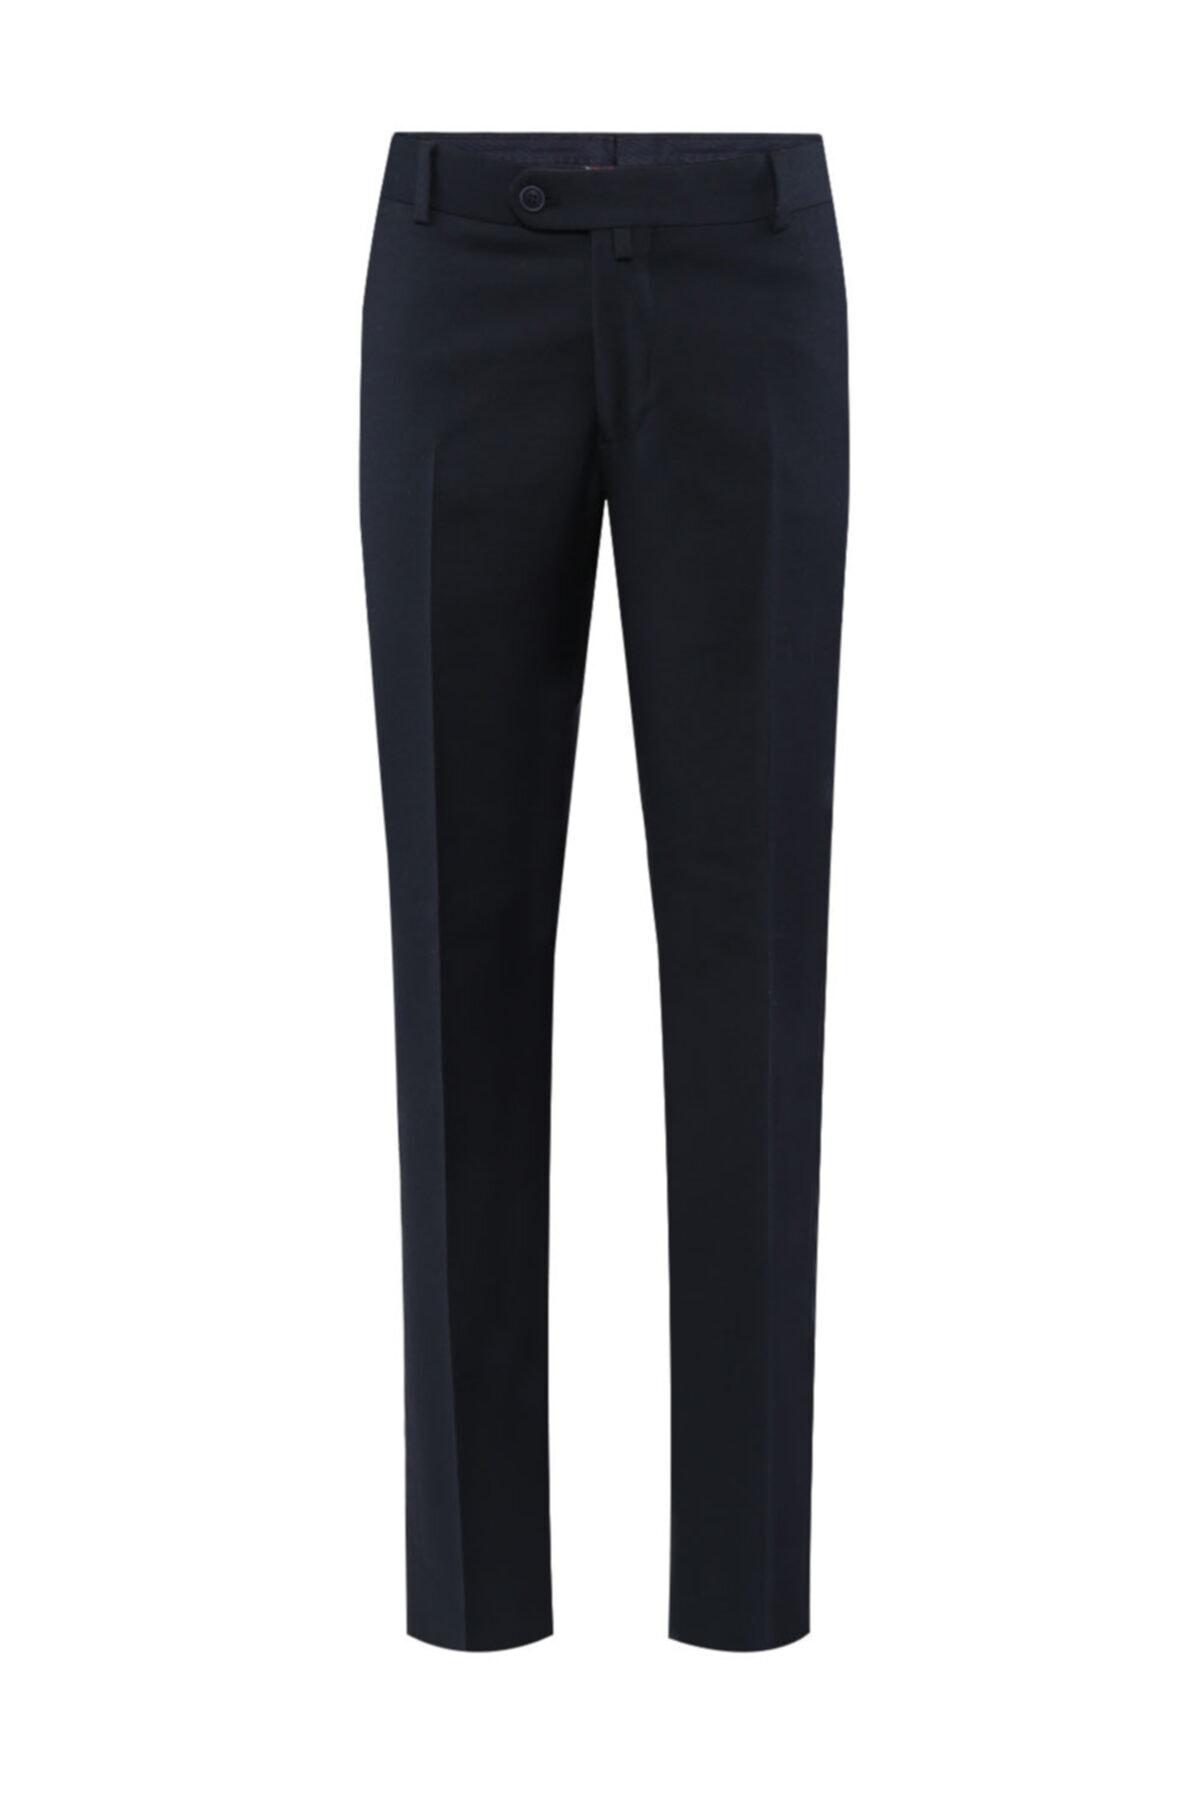 Flanel Klasik Pantolon